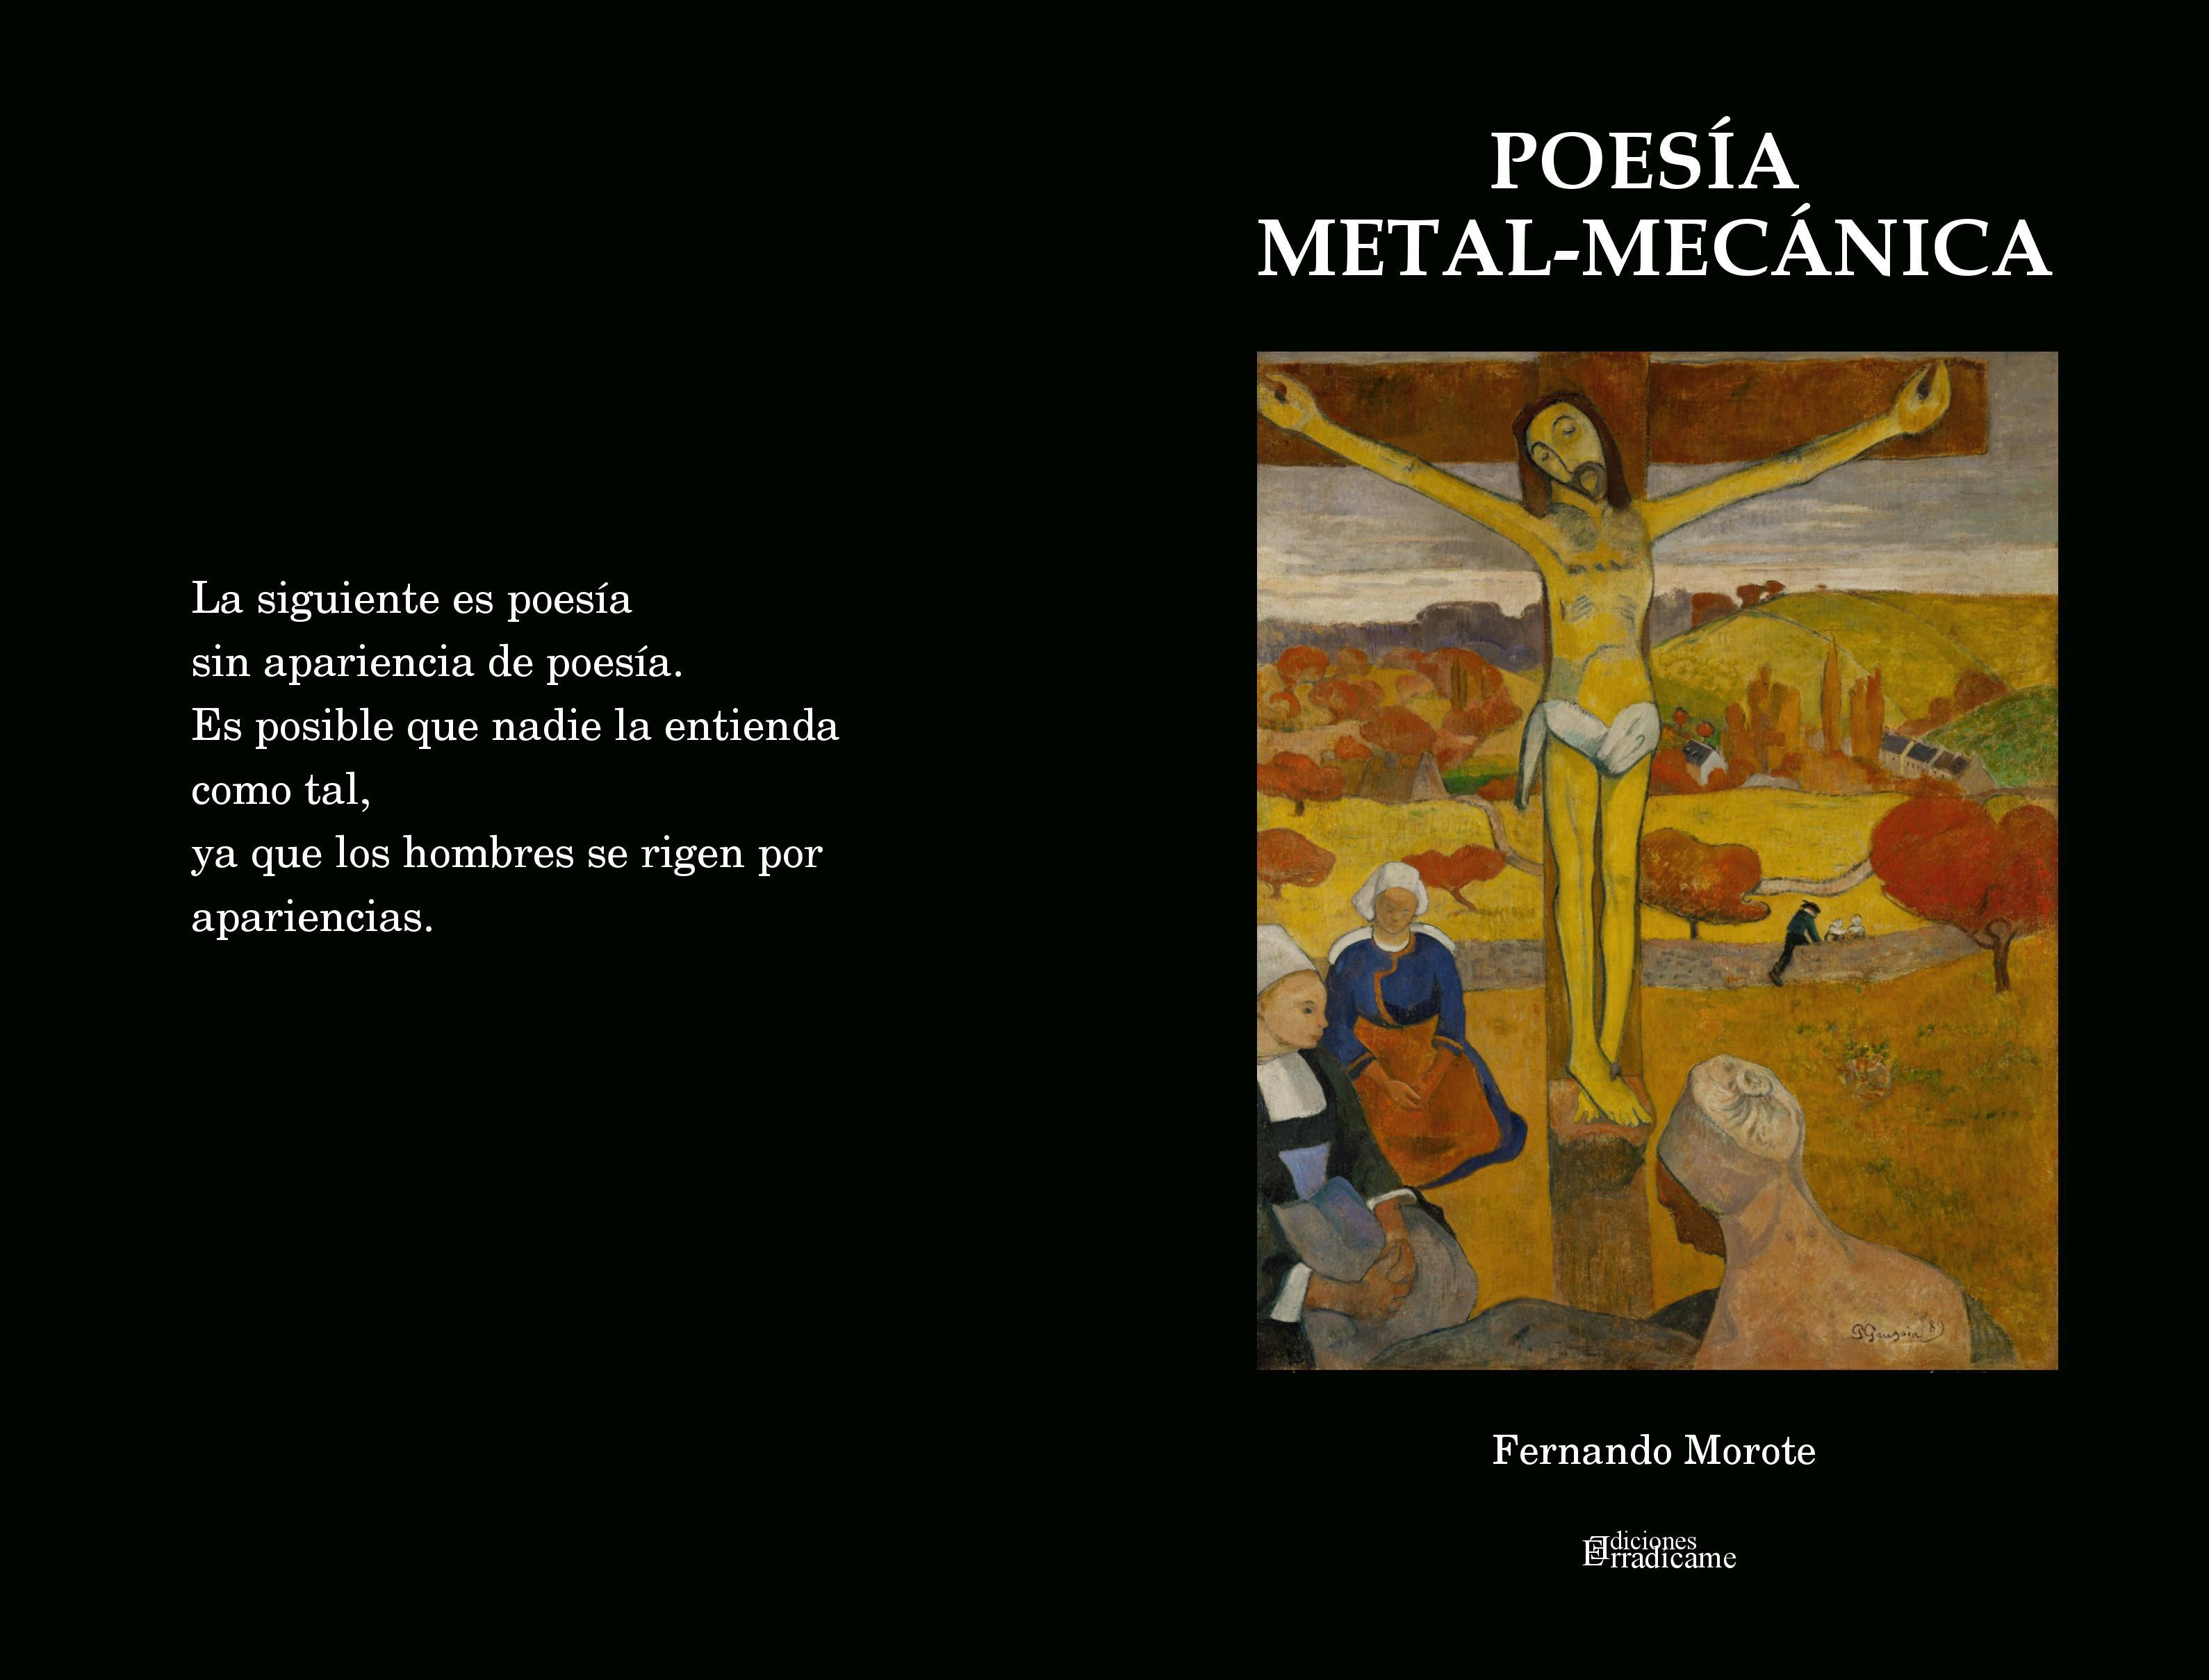 Poesía metal-mecánica, prosa poética irreverente de Fernando Morote